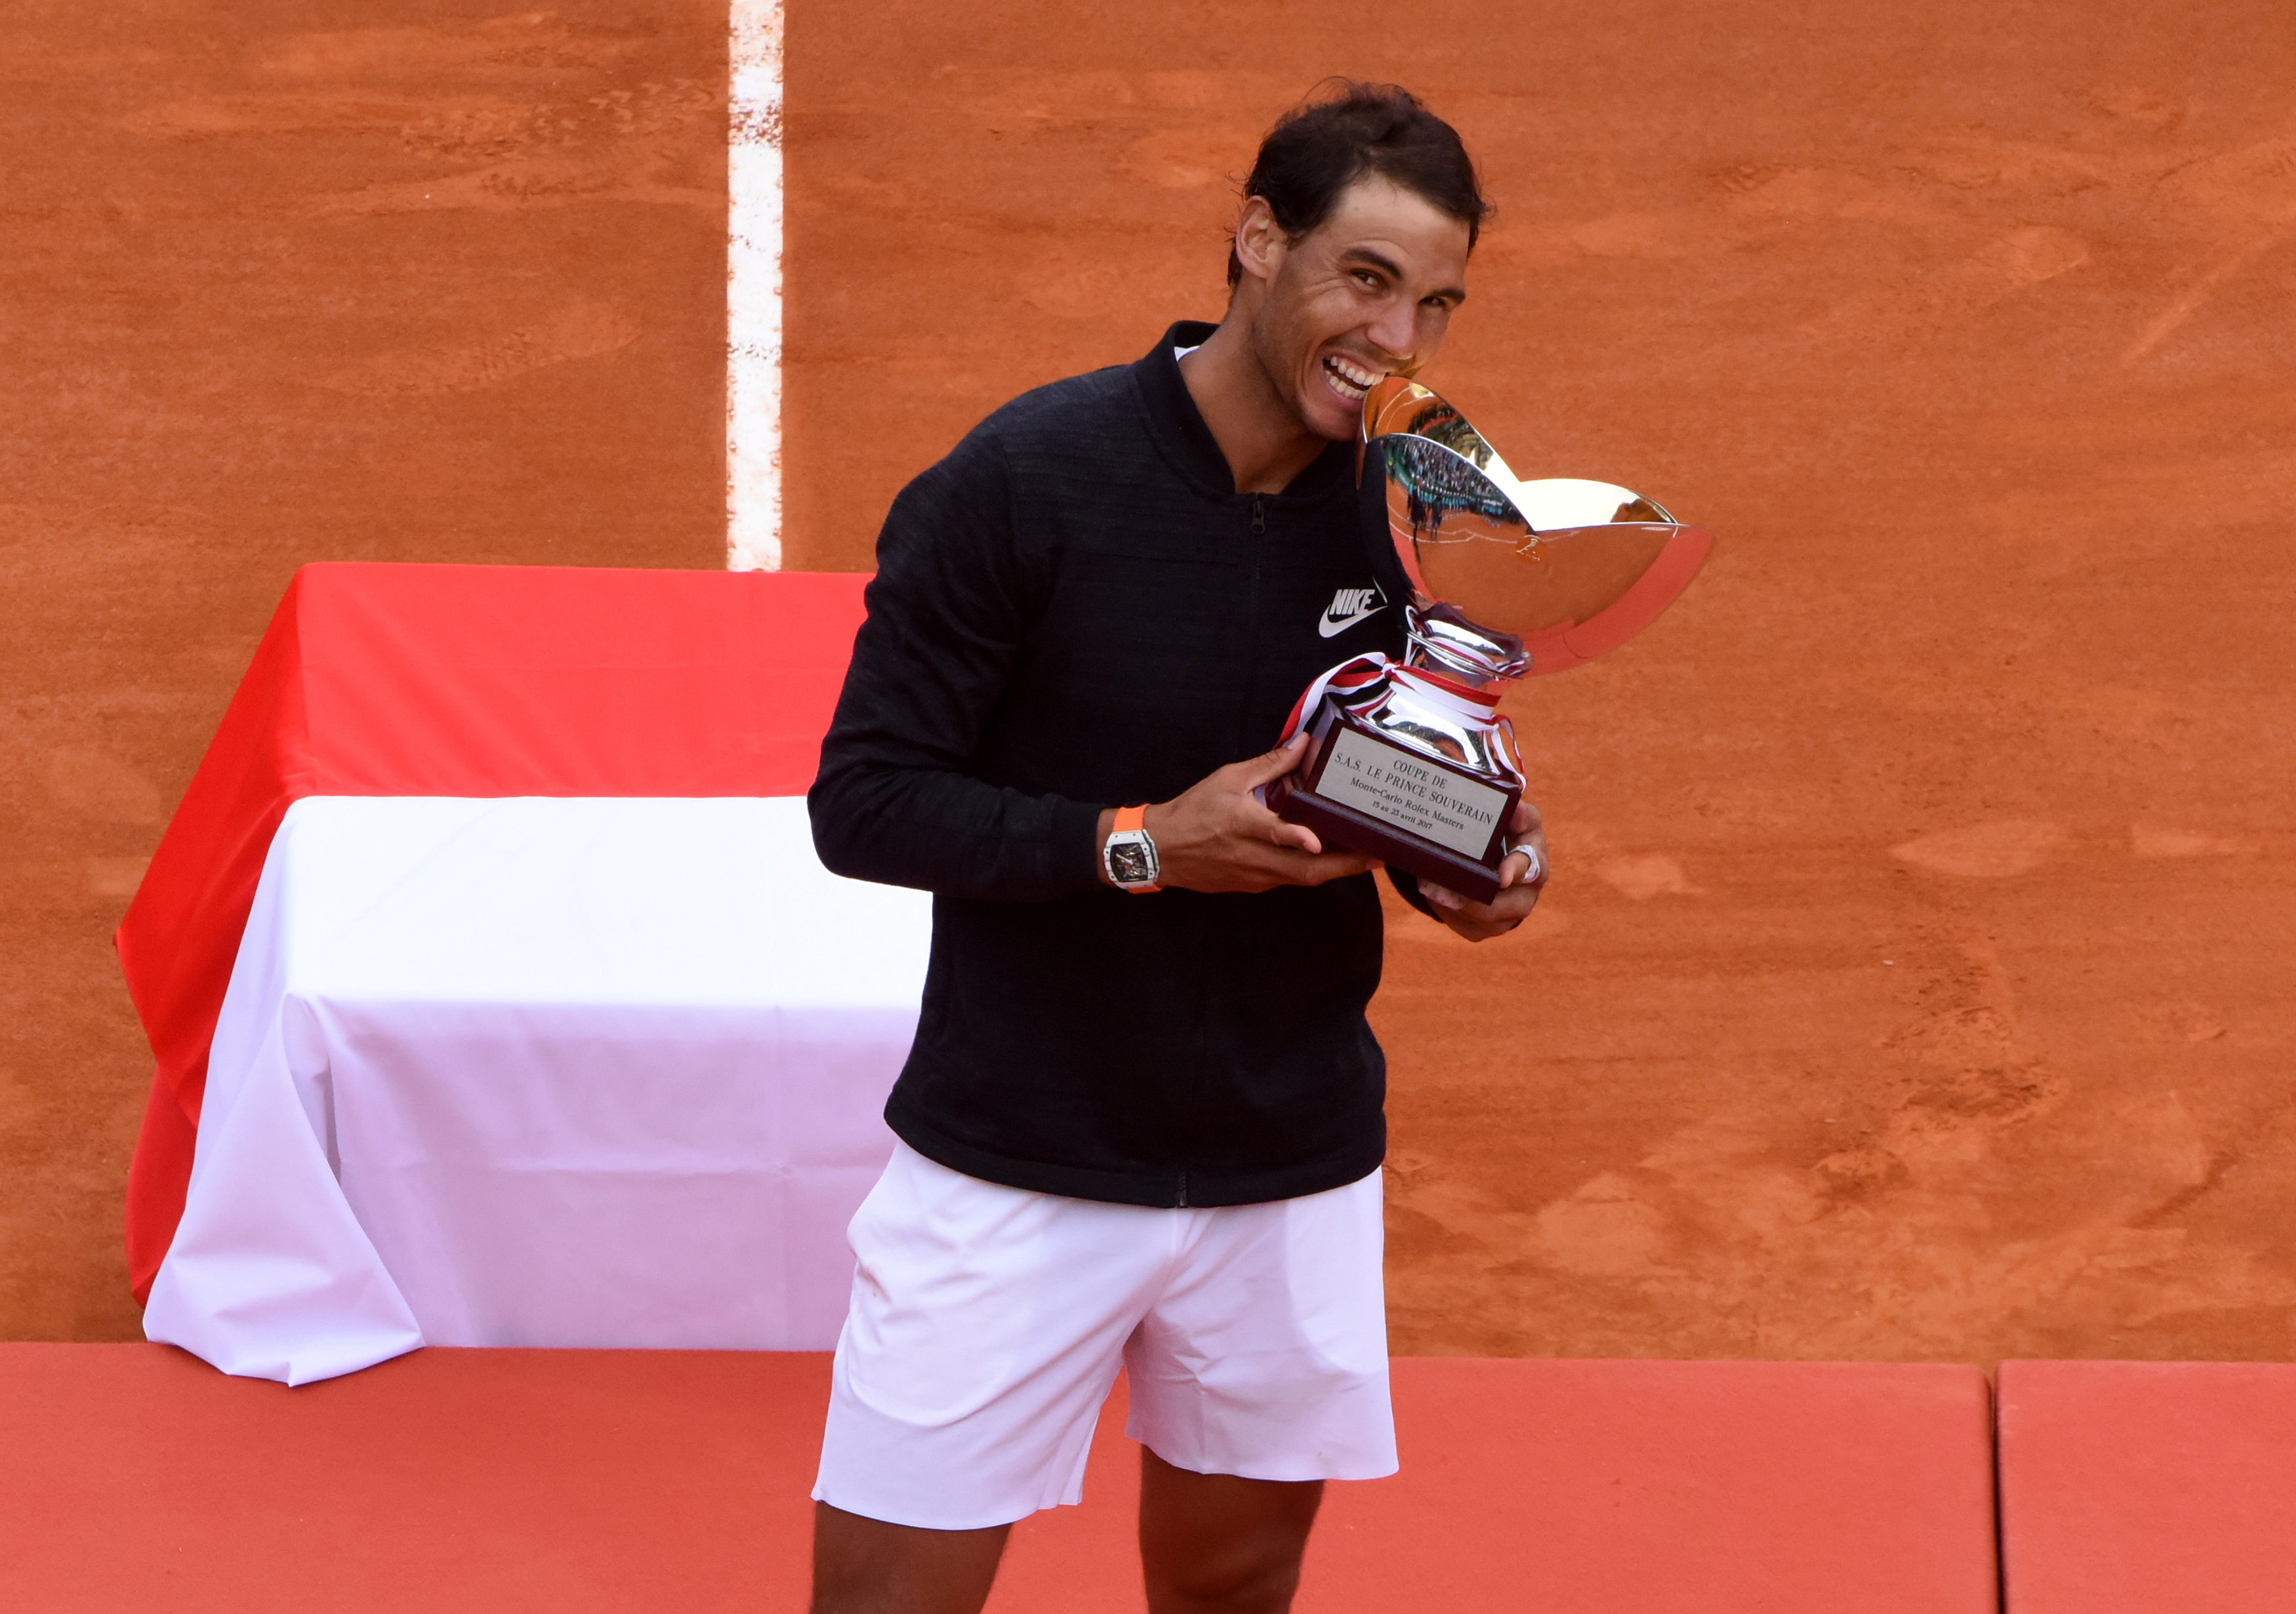 Monte-Carlo : Nadal s'offre la «decima» et marque les esprits avant Roland-Garros - ATP - Tennis